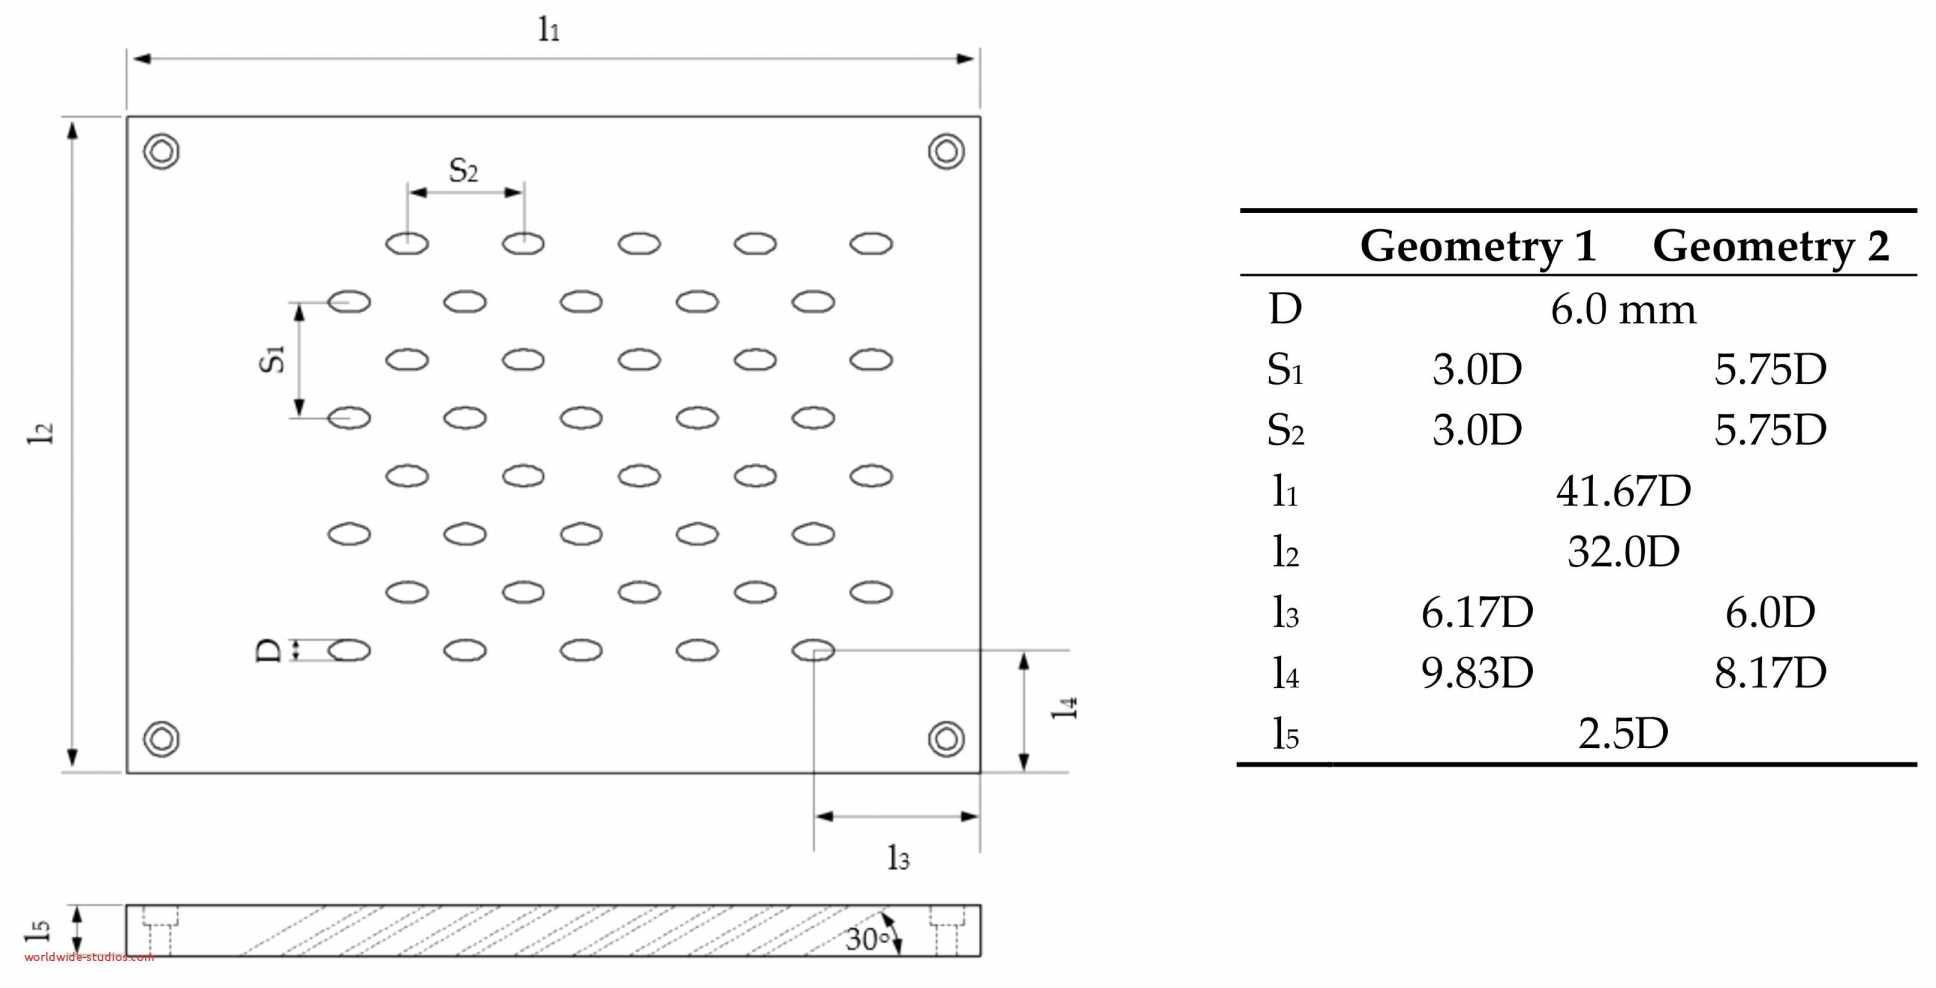 hardwood flooring cost of refinishing hardwood floors diy how much does it cost to refinish regarding diy 3 day refresh